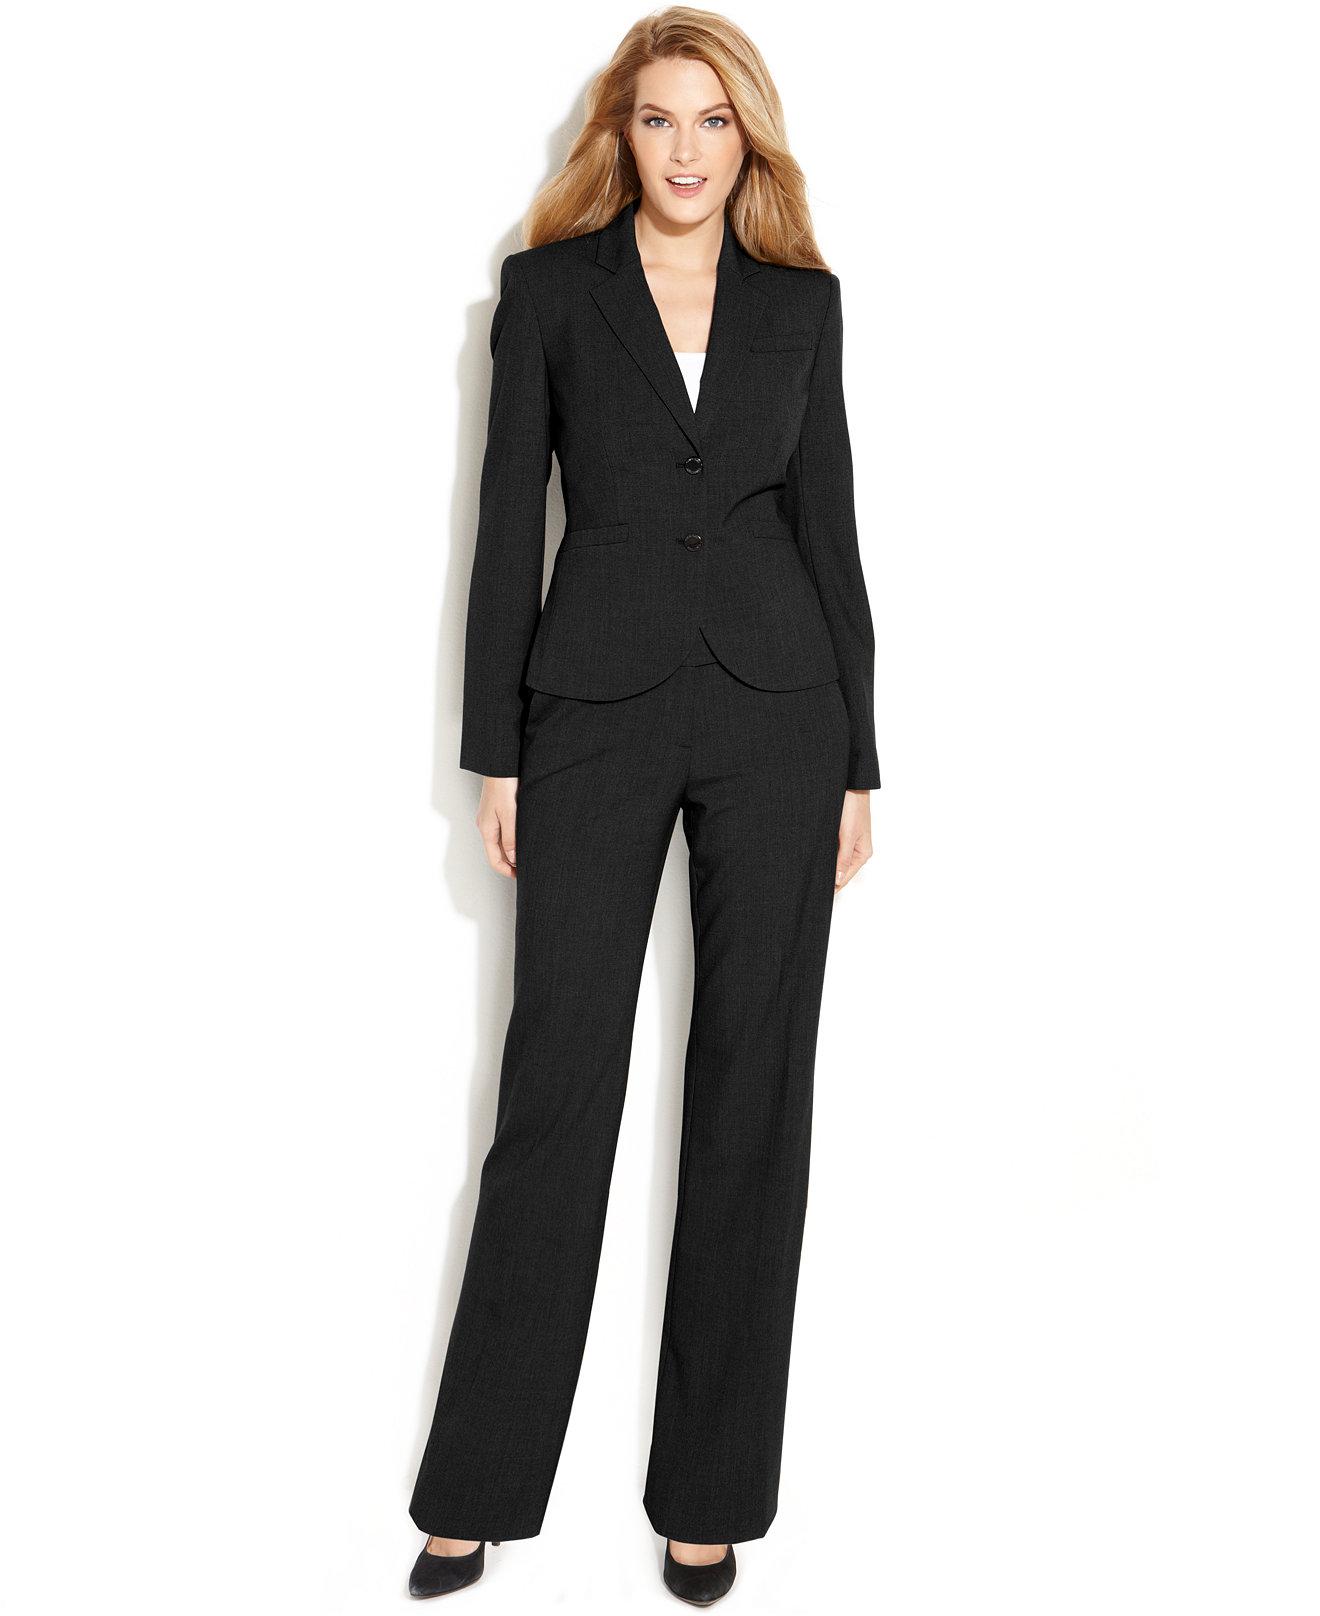 Calvin Klein Petite Stretch Blend Suit Separates Collection - Wear ...